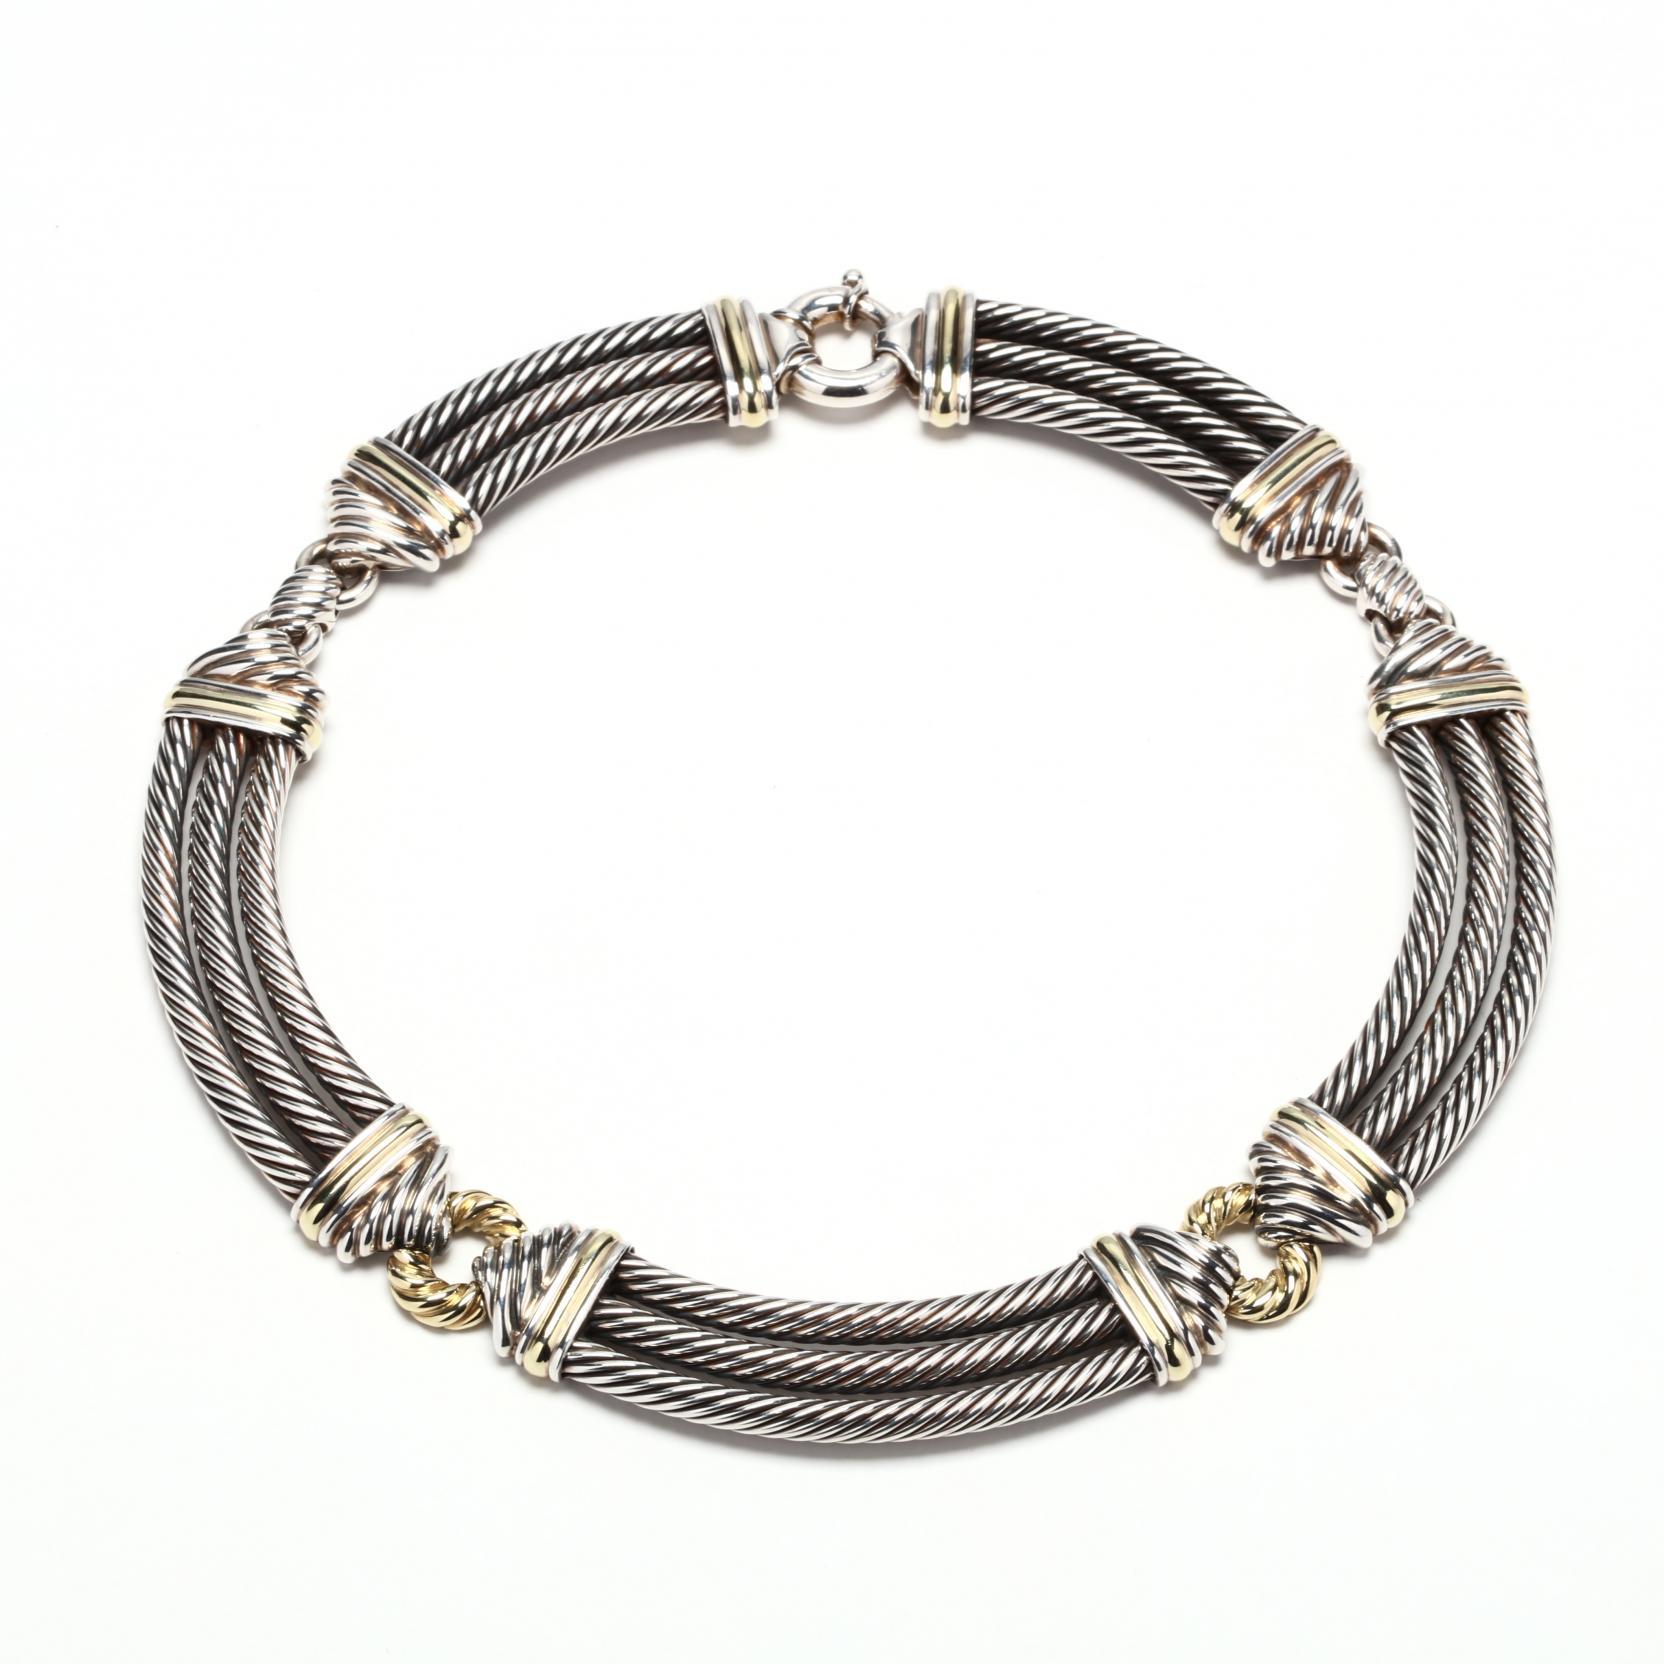 sterling-silver-and-14kt-gold-choker-david-yurman